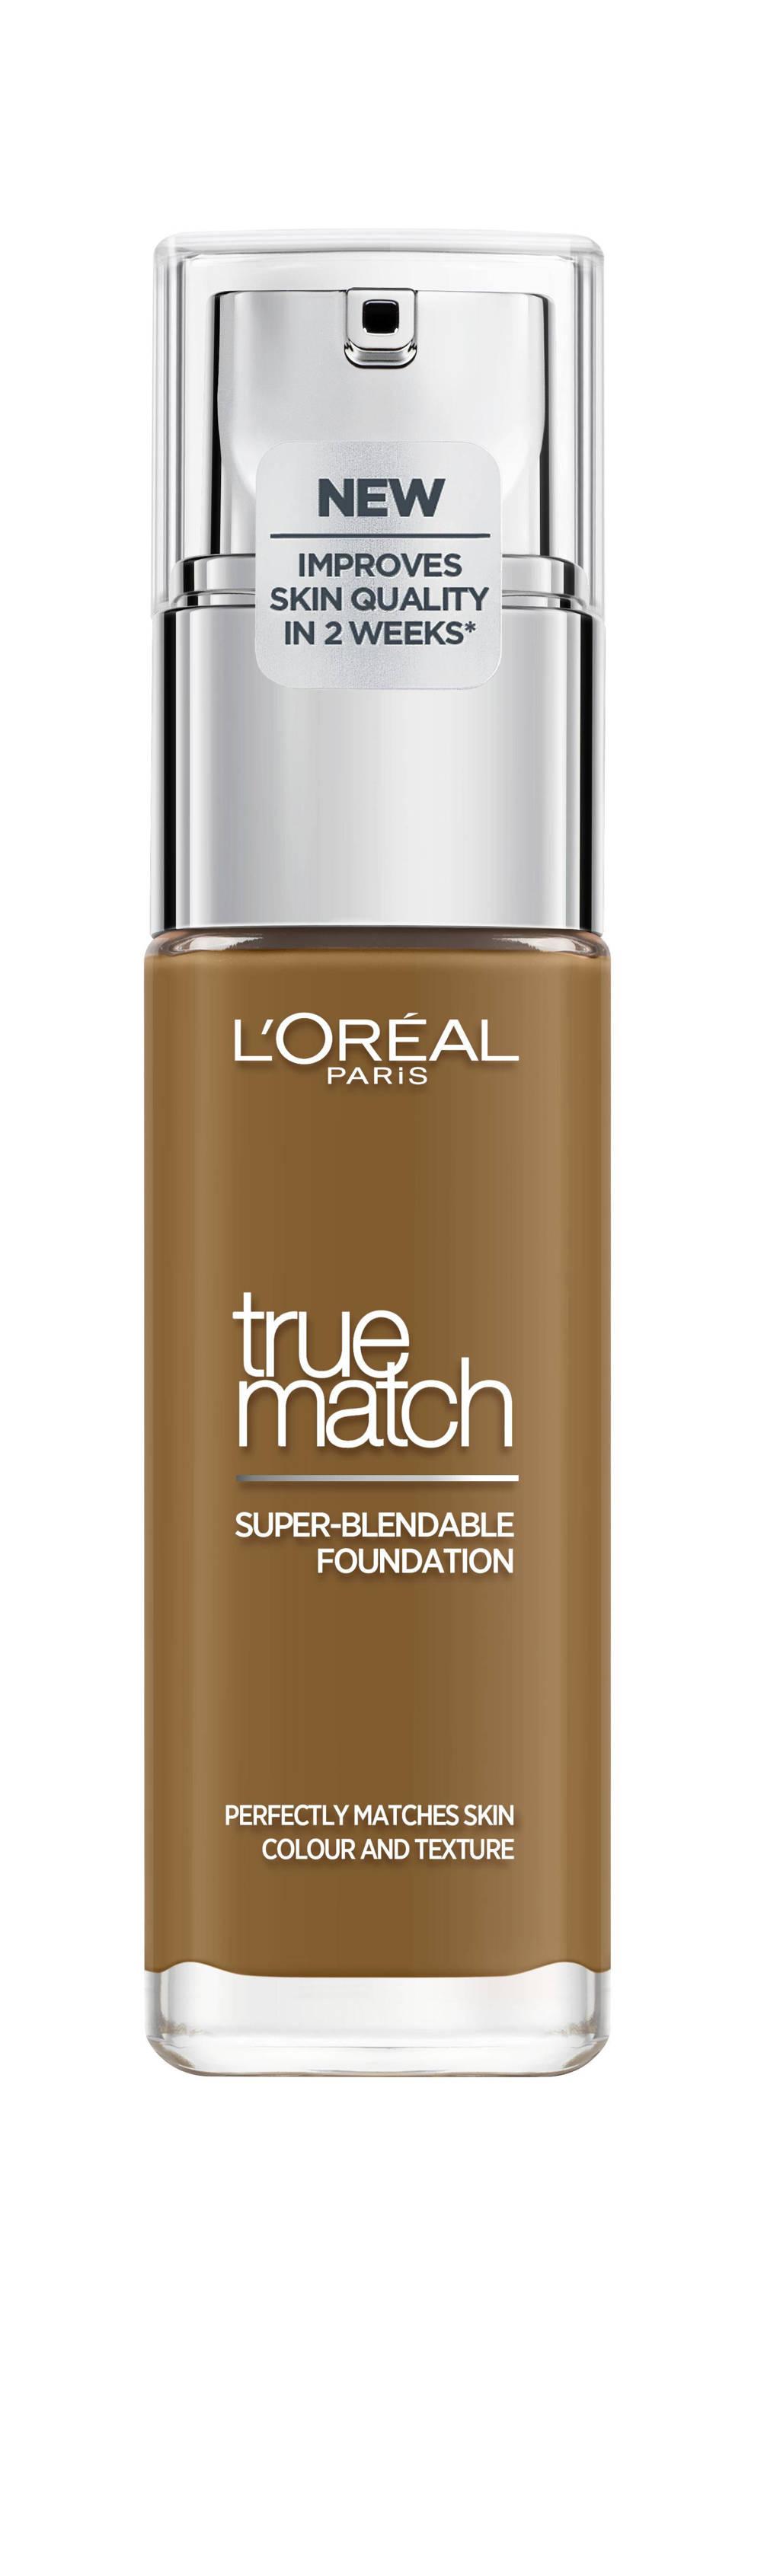 L'Oréal Paris True Match Foundation - 8.N Cappuccino, 8N Cappuccino